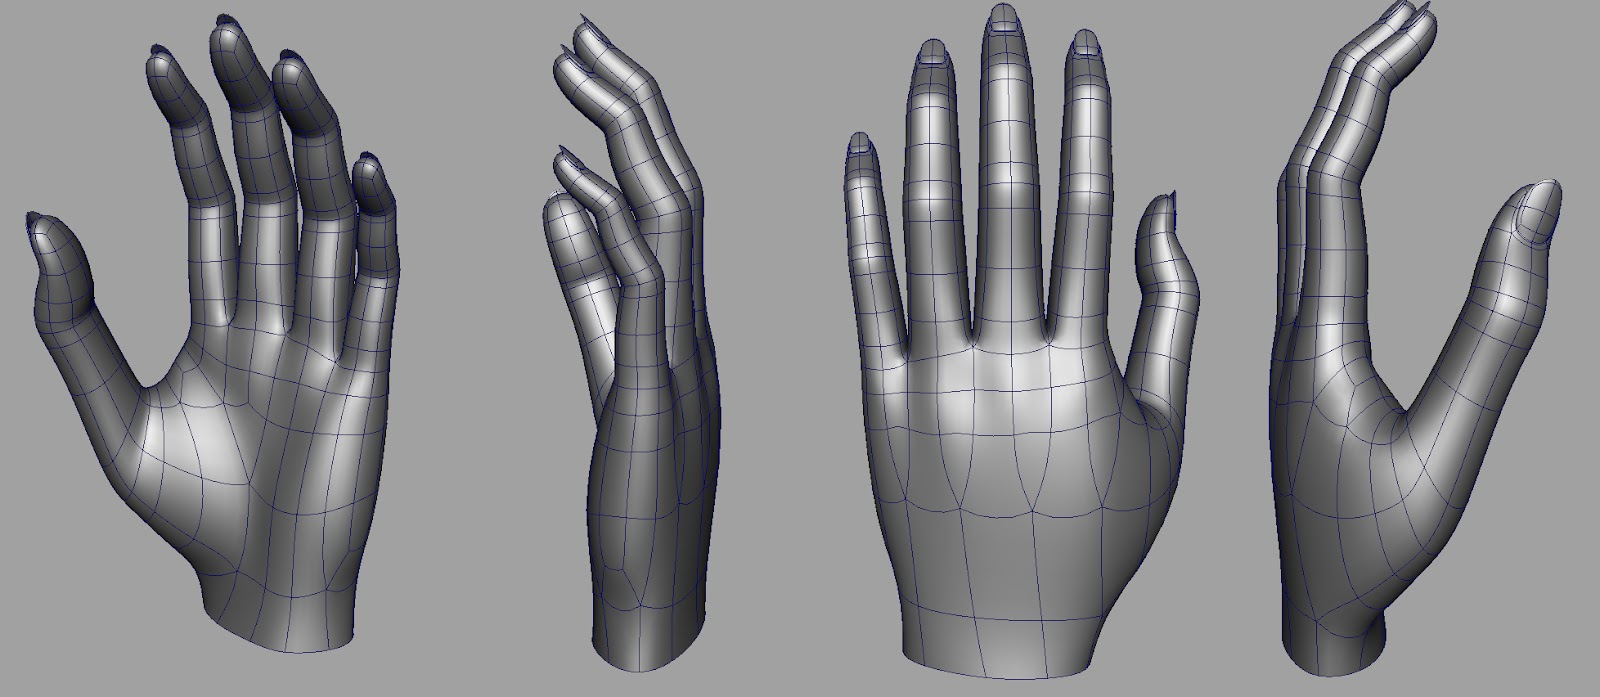 MillicentHawk⌭Optimal-Contact⋅cyber涙—Hands.jpg